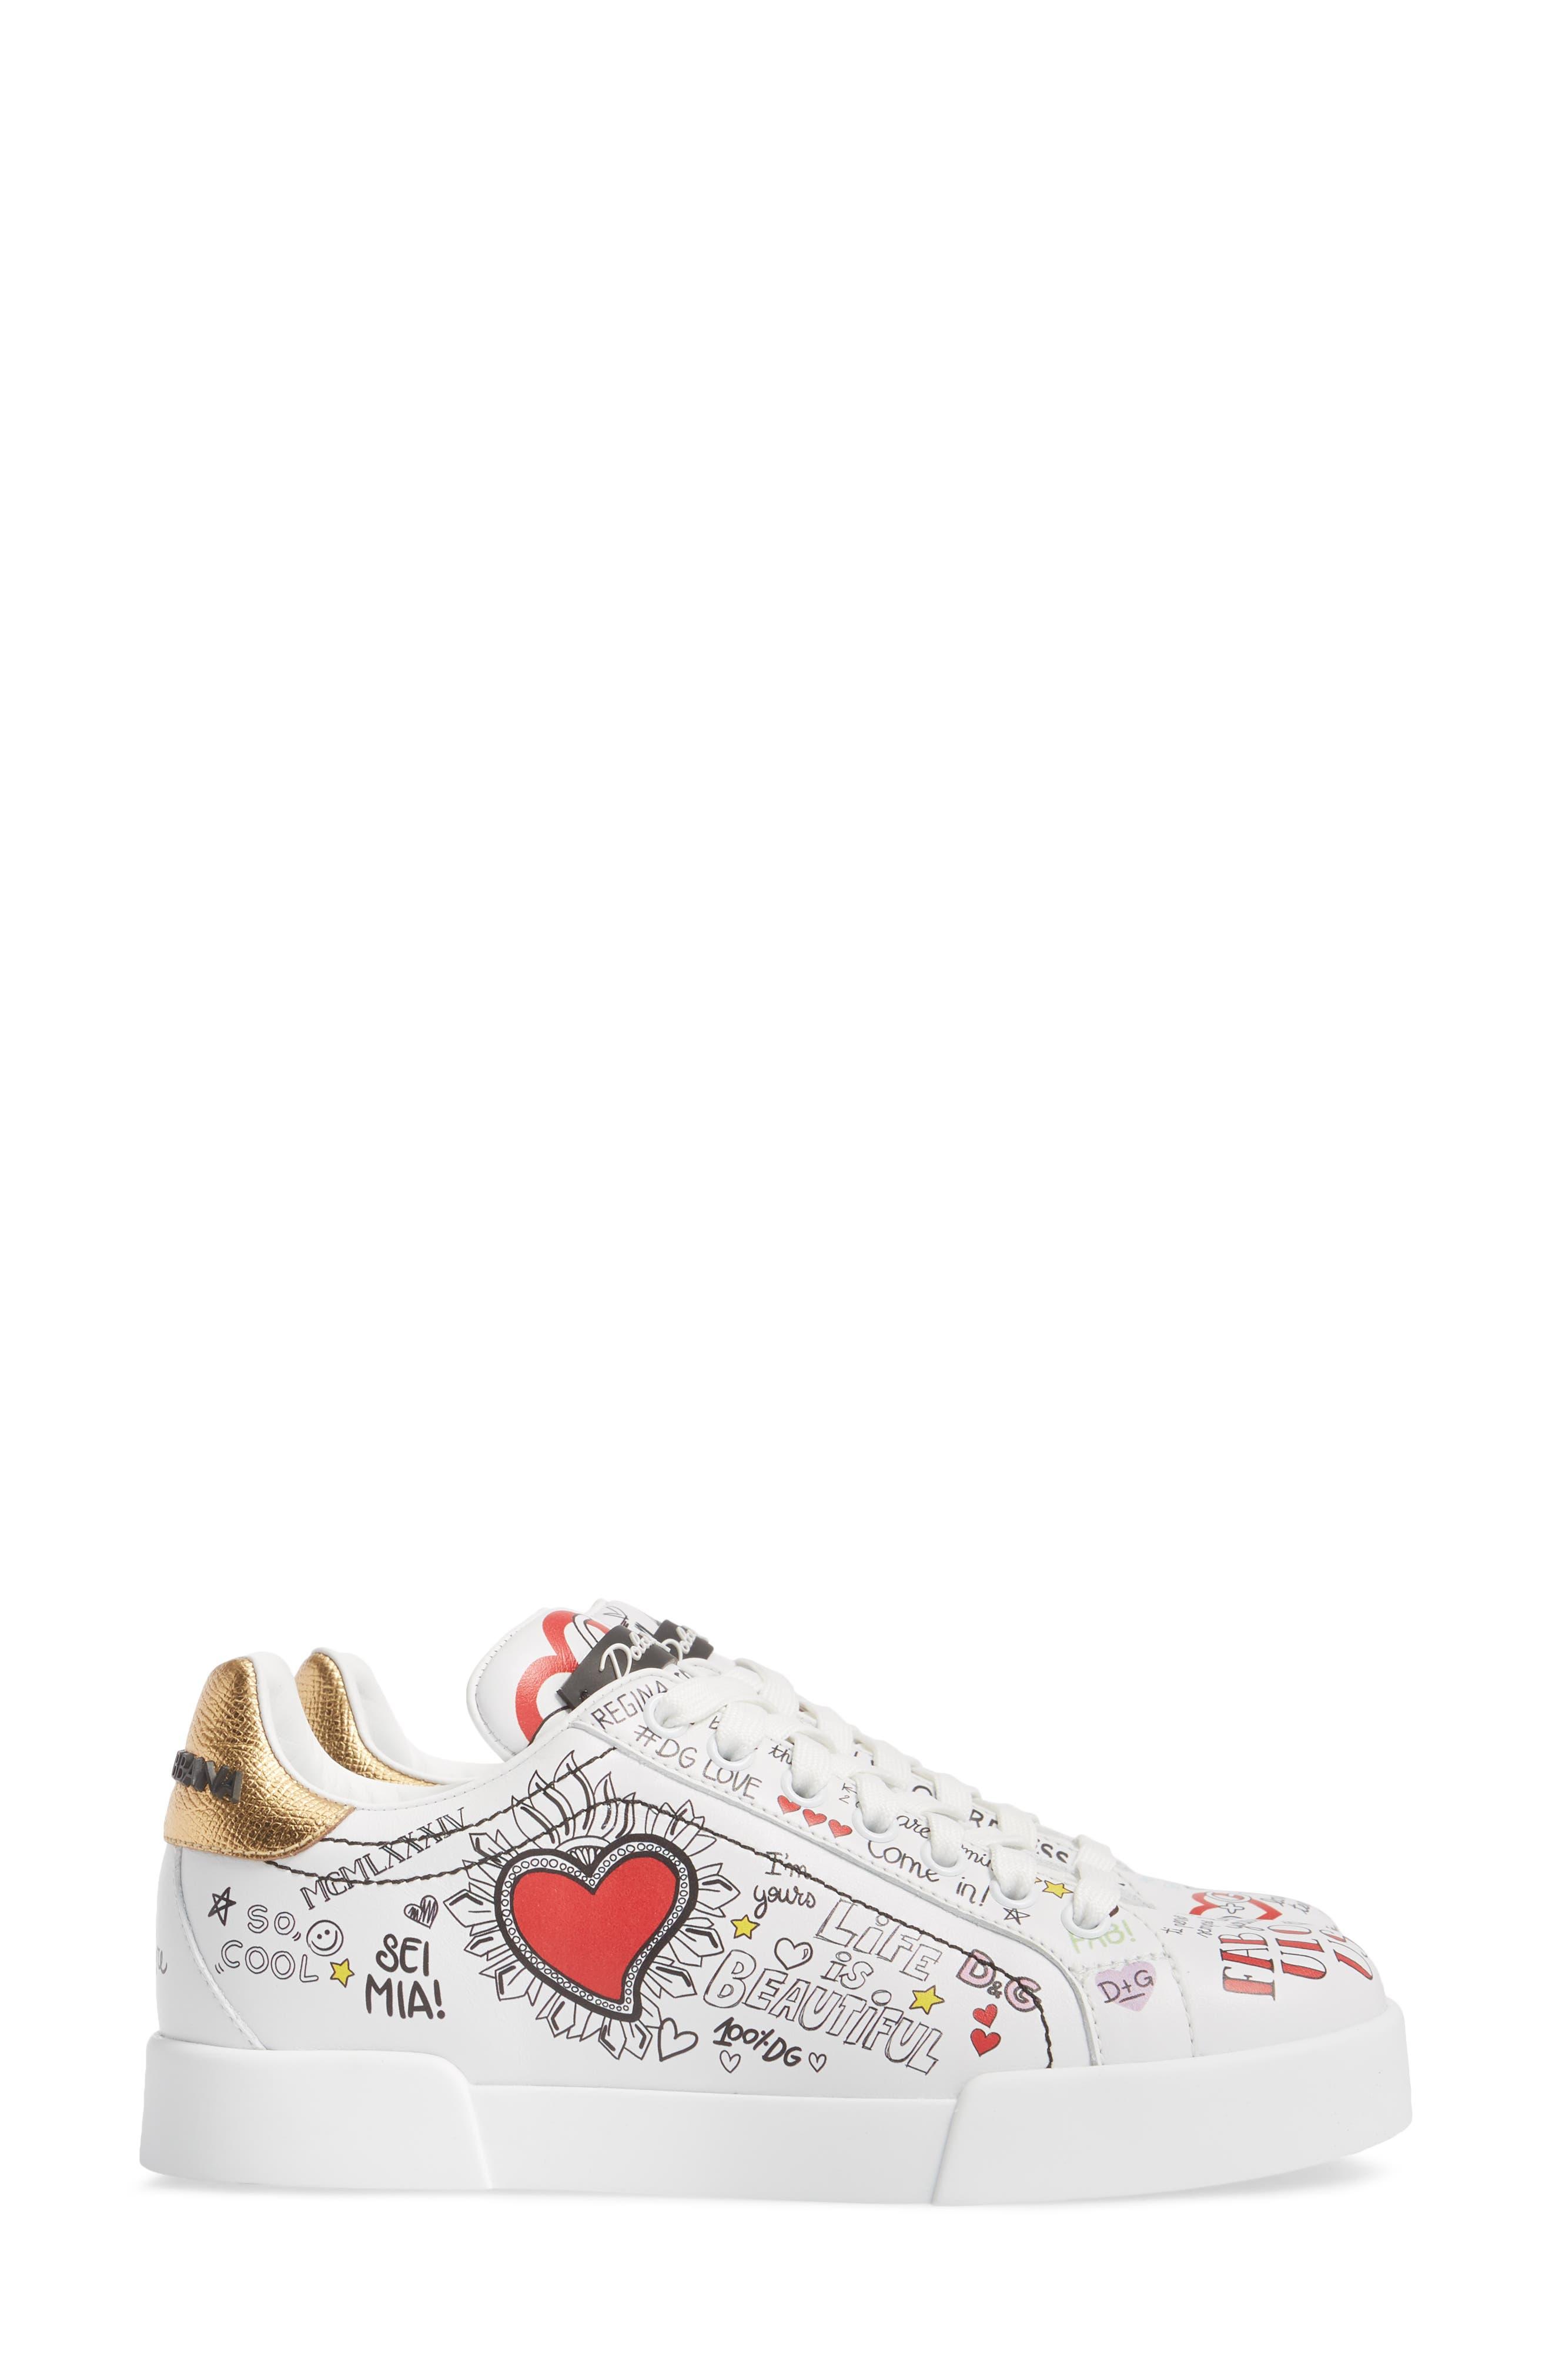 Graffiti Sneaker,                             Alternate thumbnail 4, color,                             White